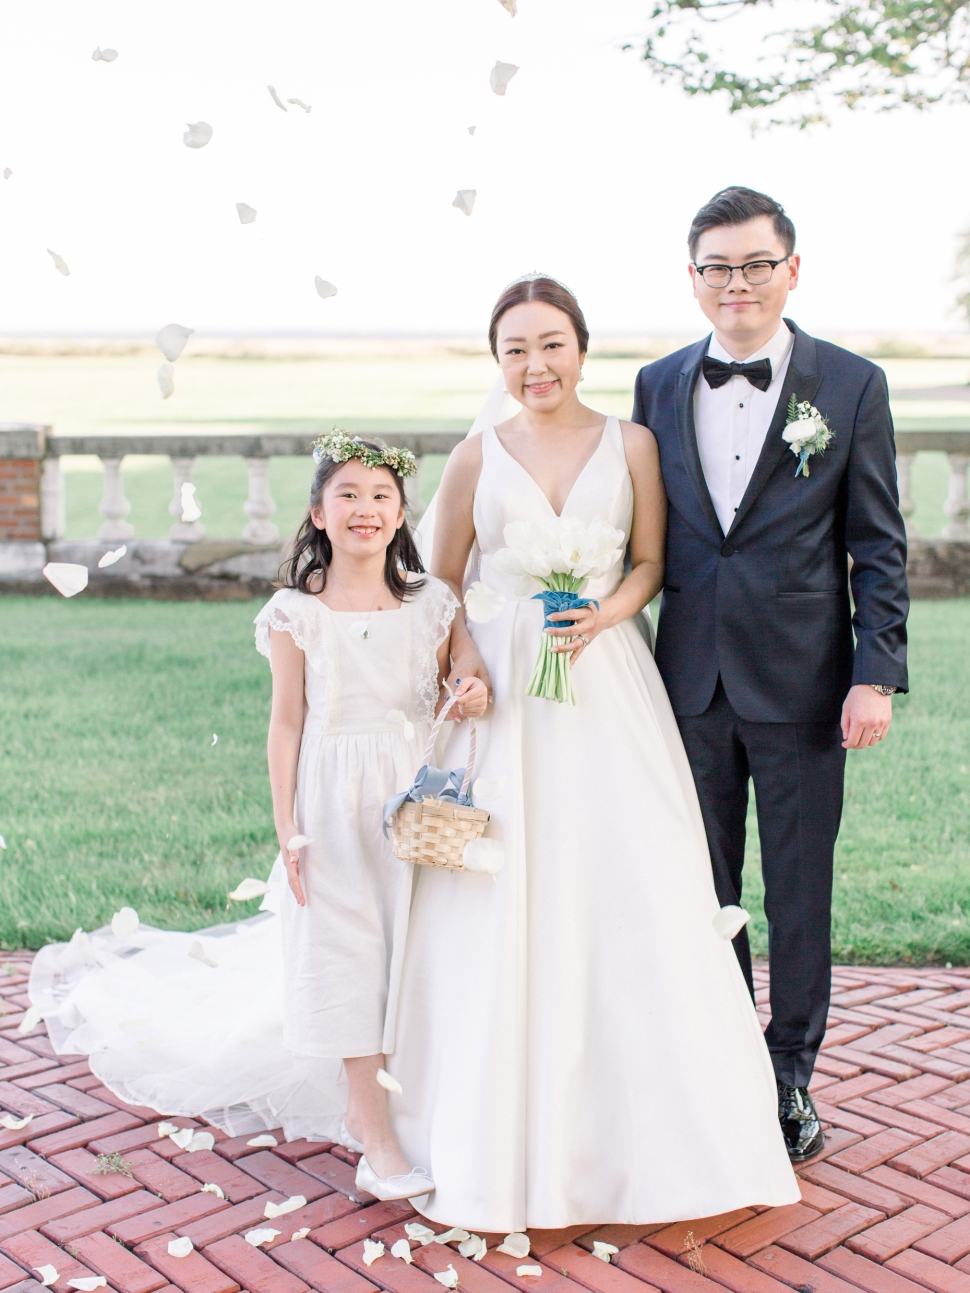 Bourne-Mansion-Wedding-Photos-Cassi-Claire-Long-Island-Wedding-Photographer_29.jpg